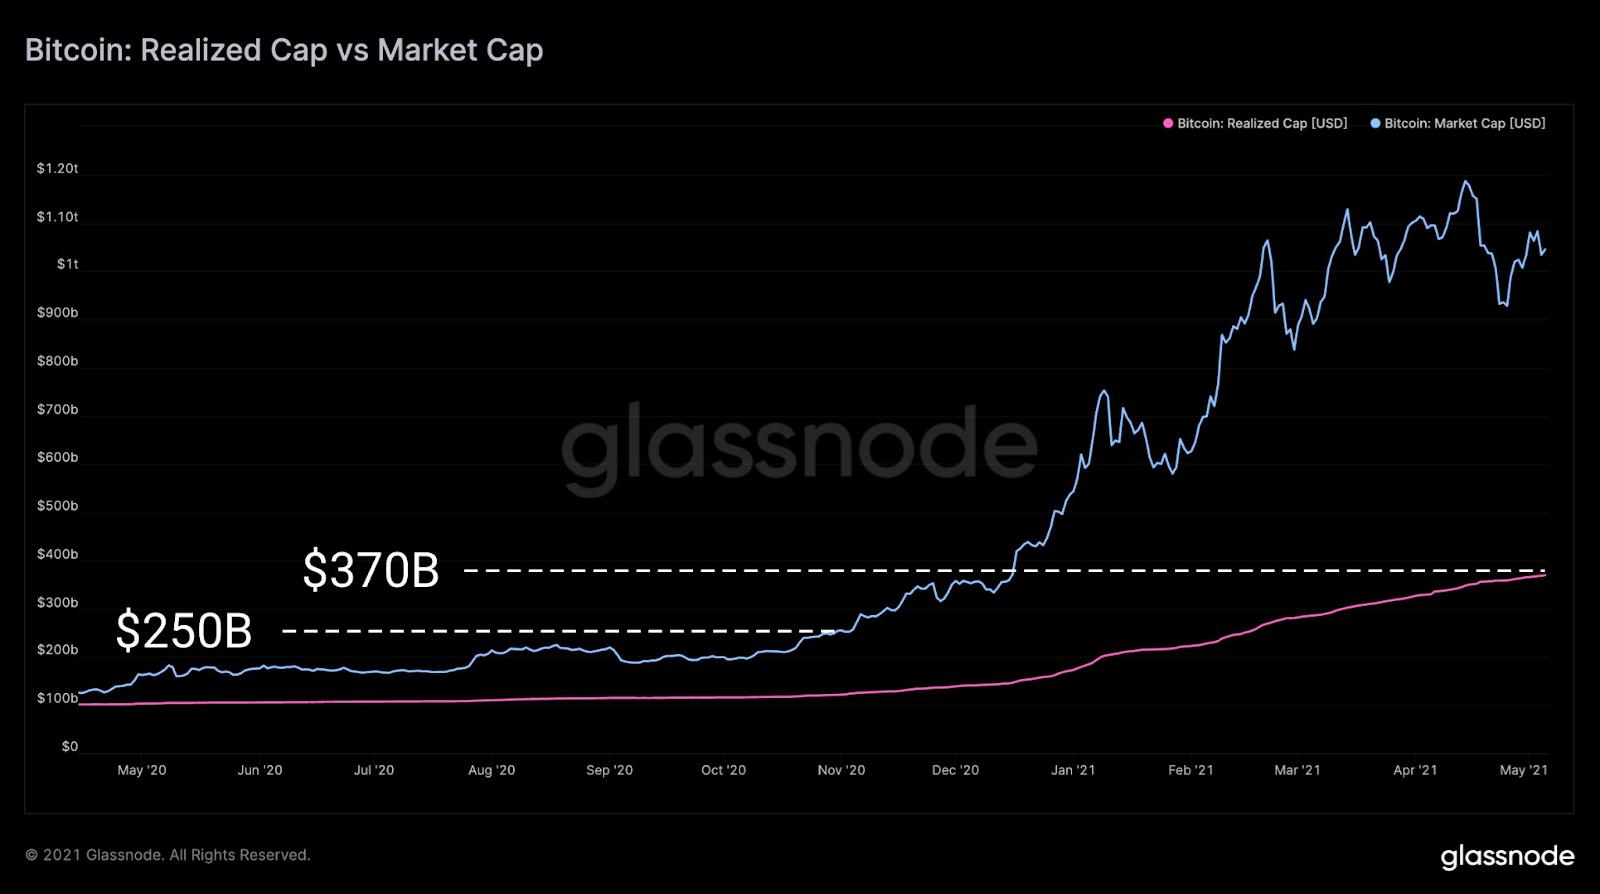 BTC Realized Cap vs. market Cap